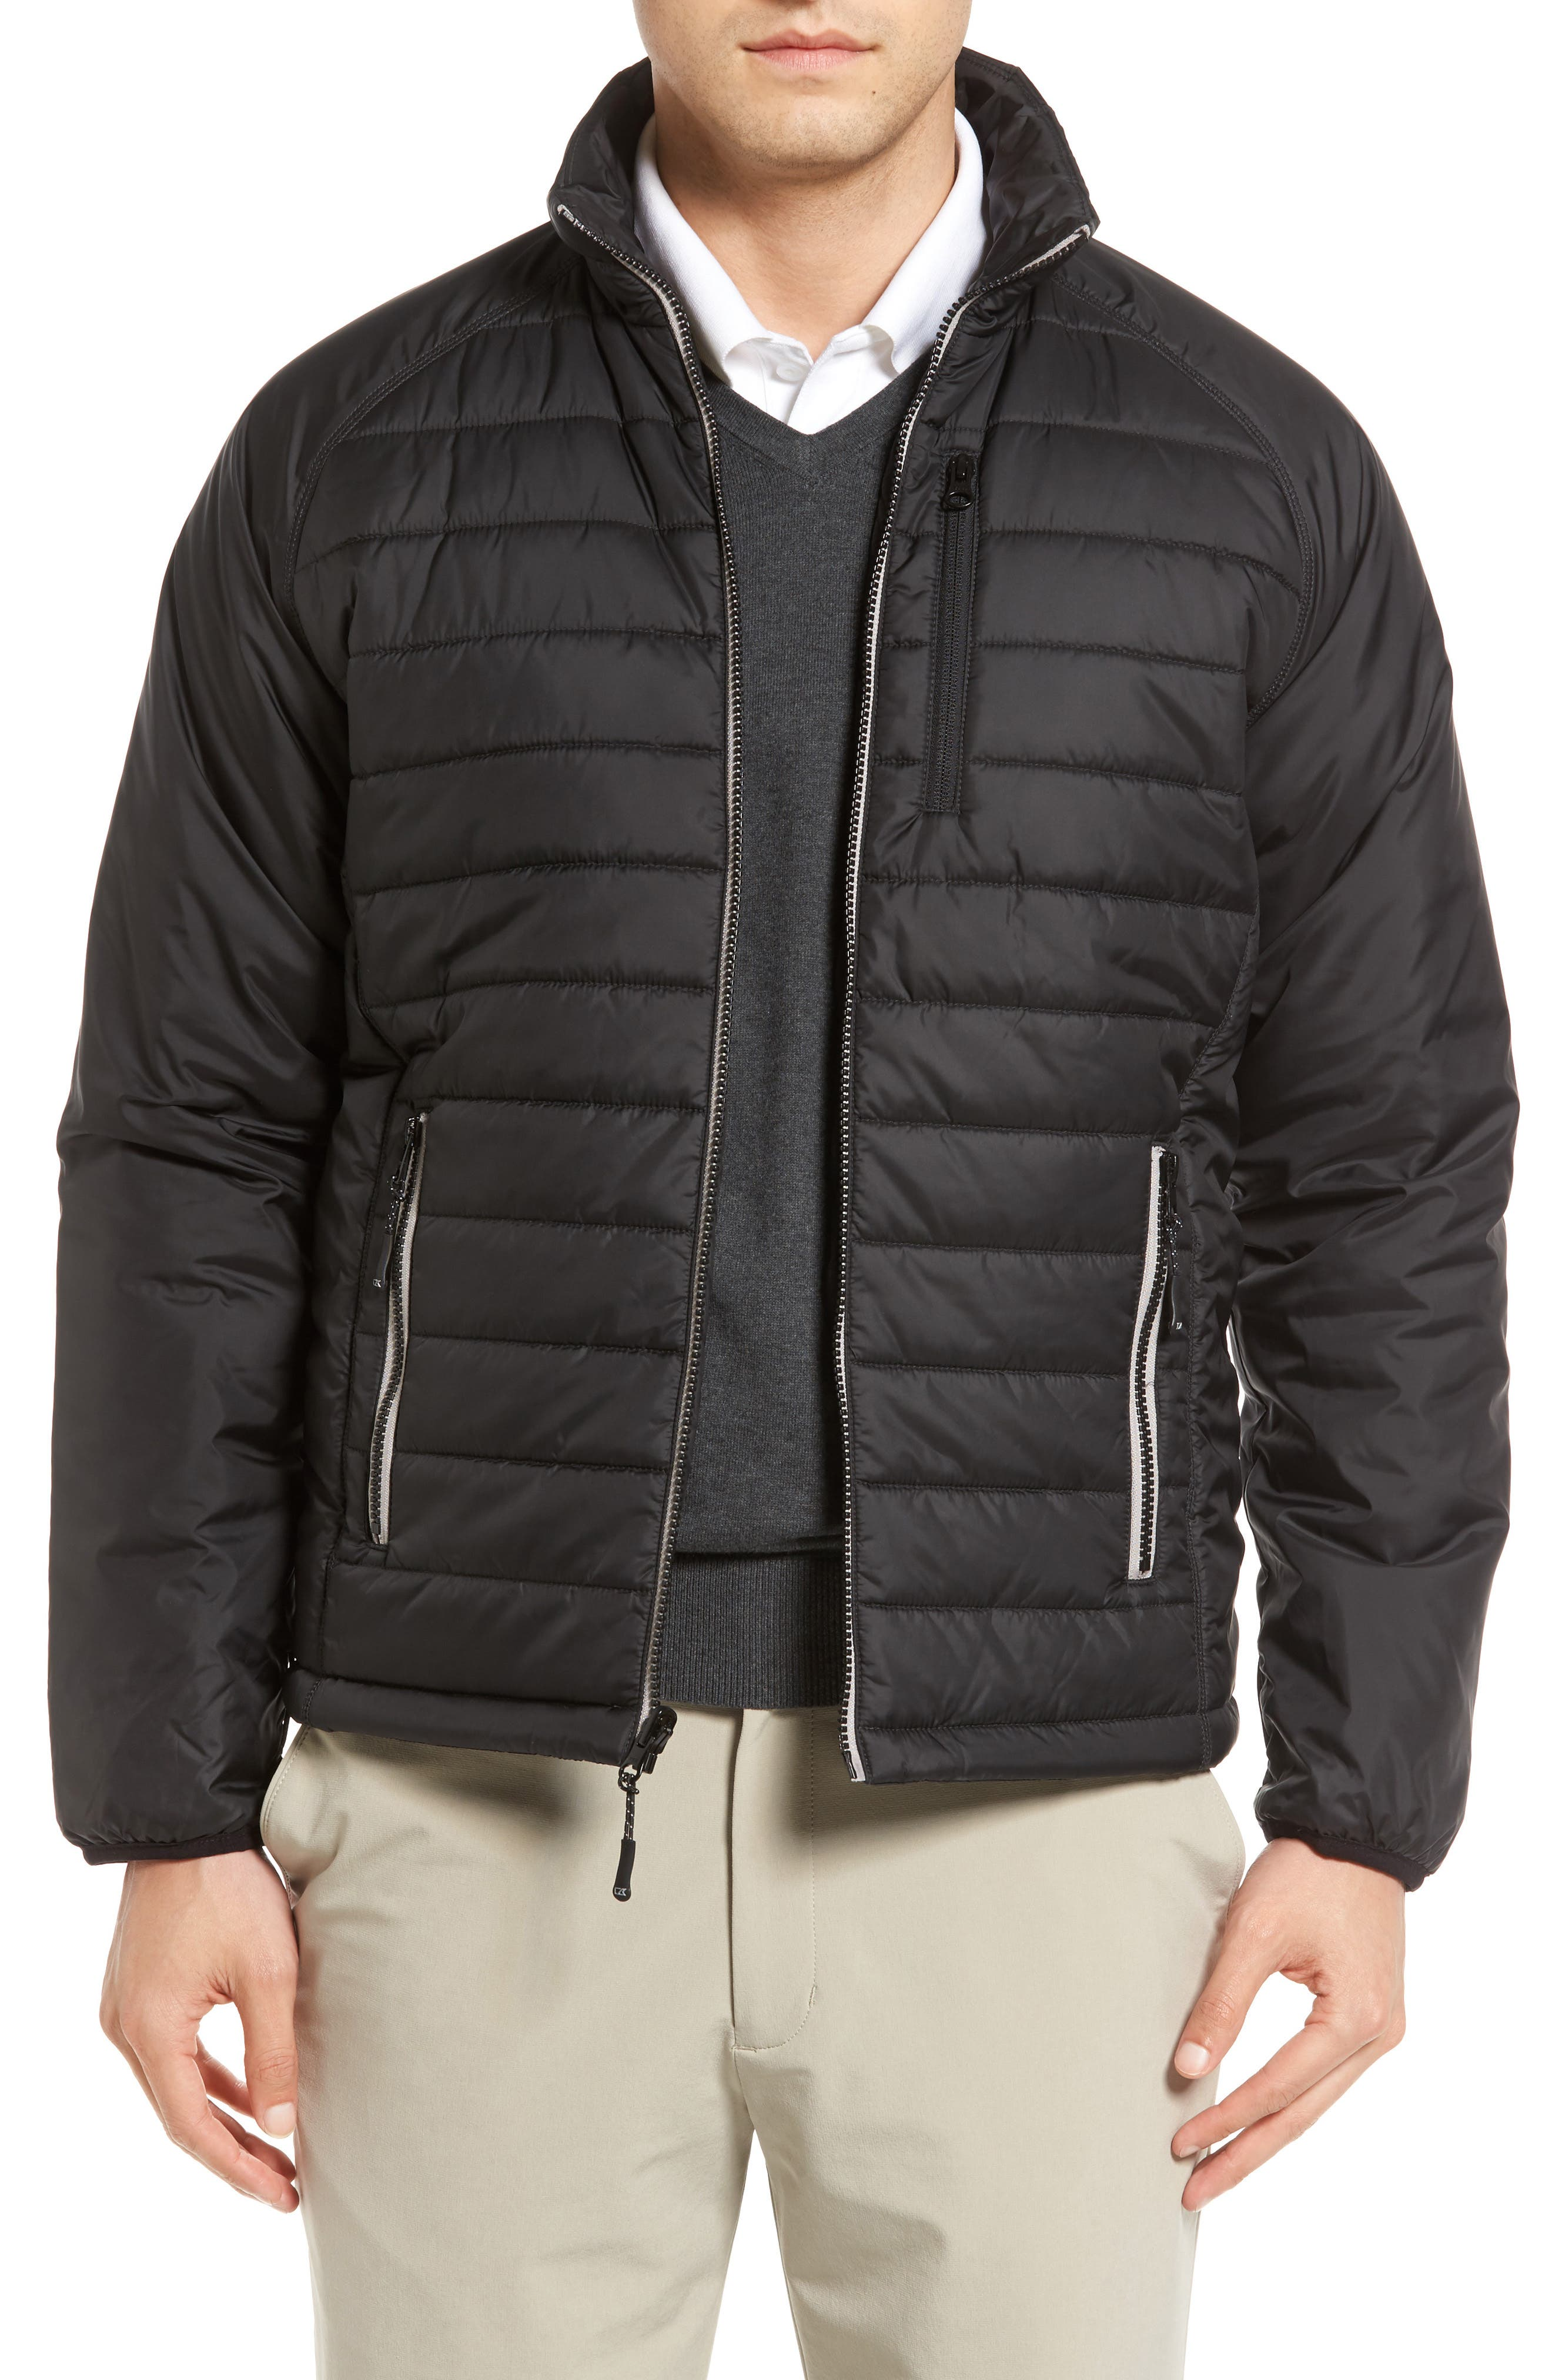 Barlow Pass Quilted Jacket,                             Main thumbnail 1, color,                             001